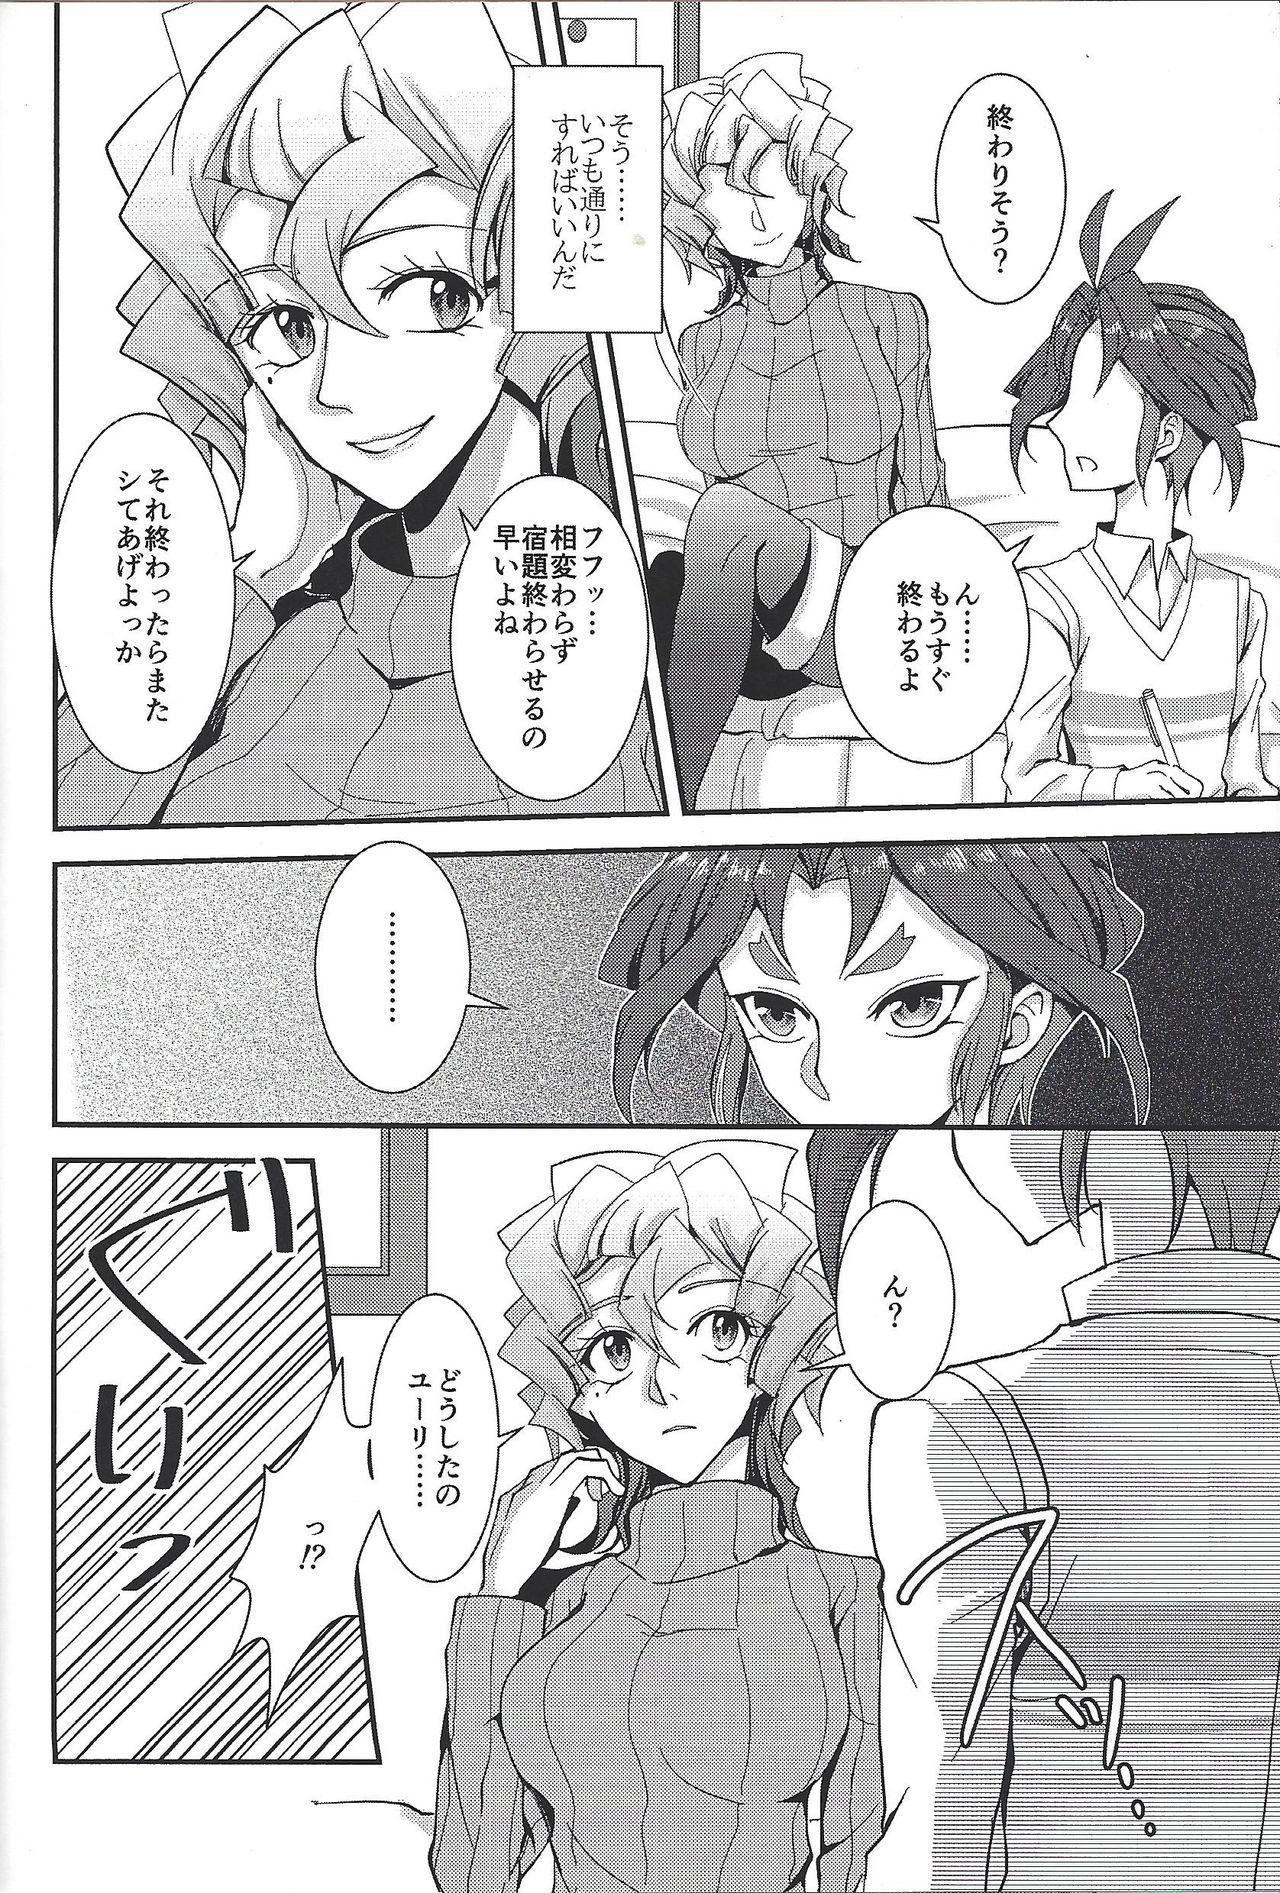 Saitei na Koi o Shiyou 12